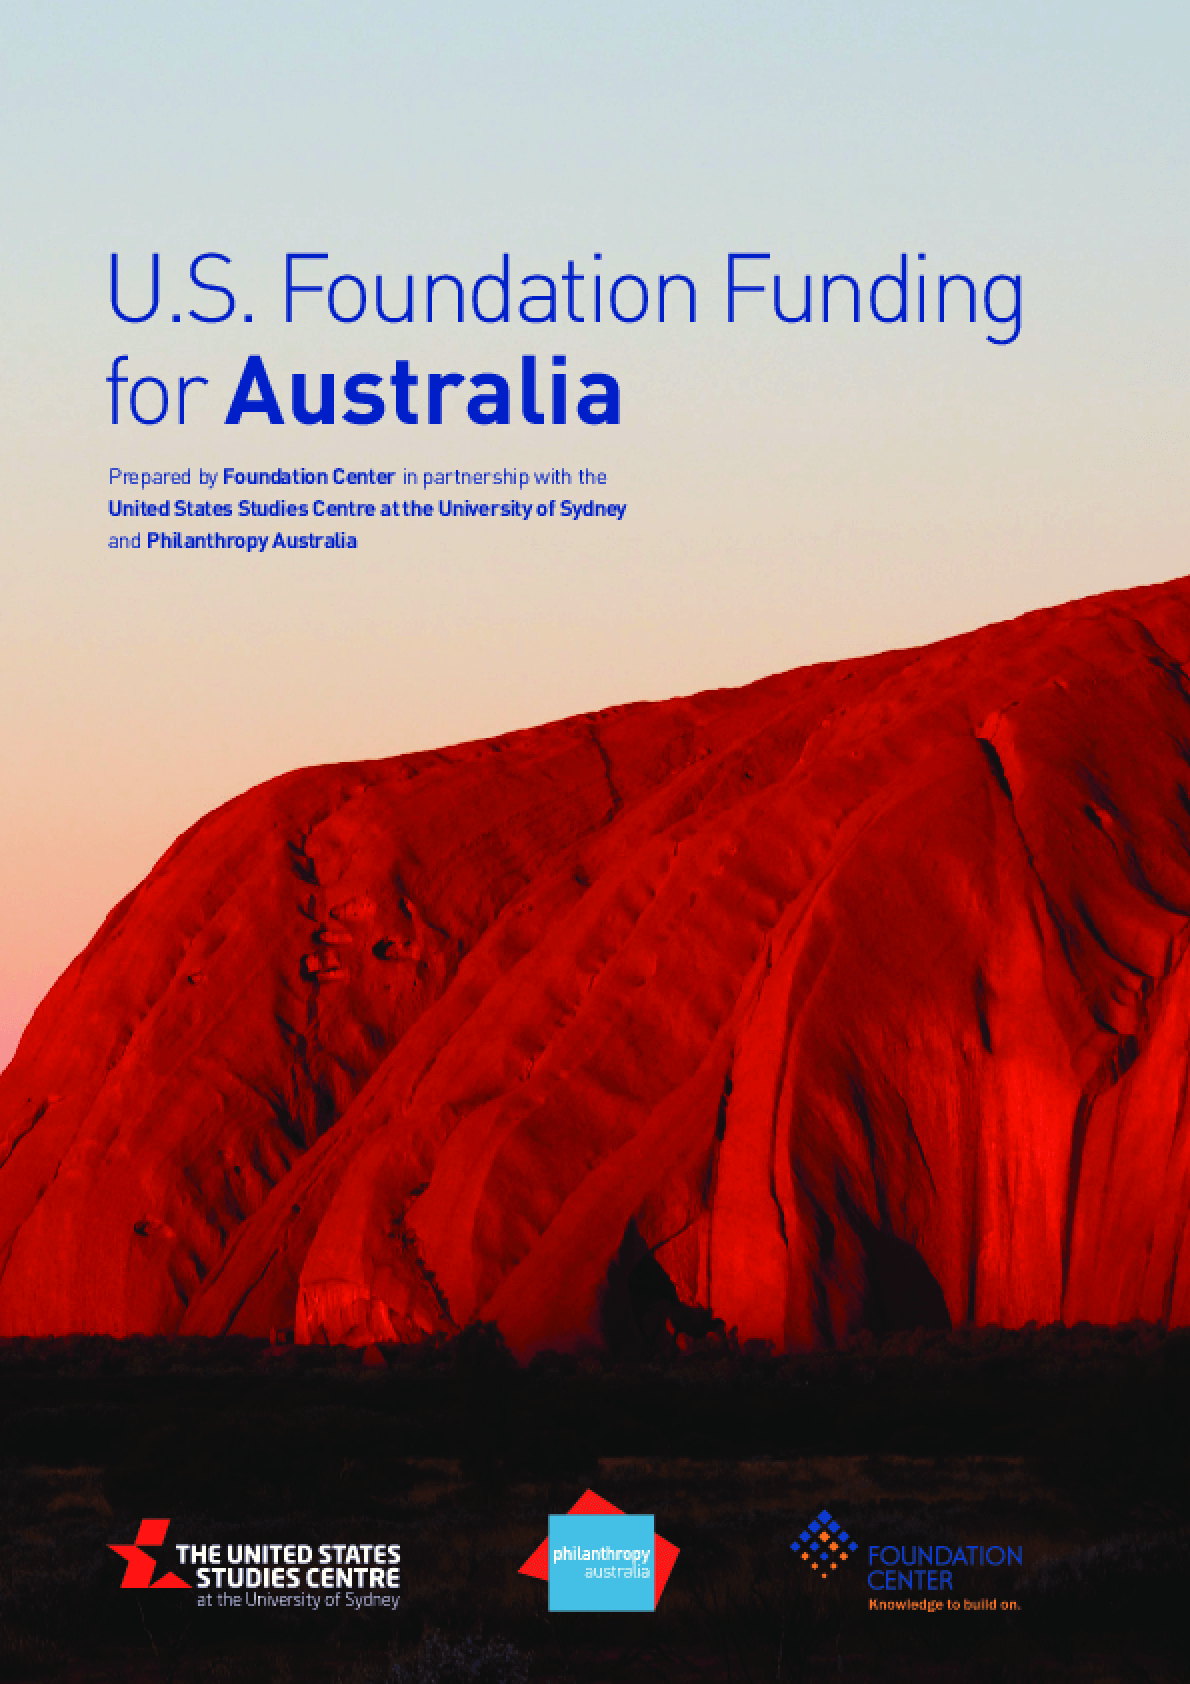 U.S. Foundation Funding for Australia